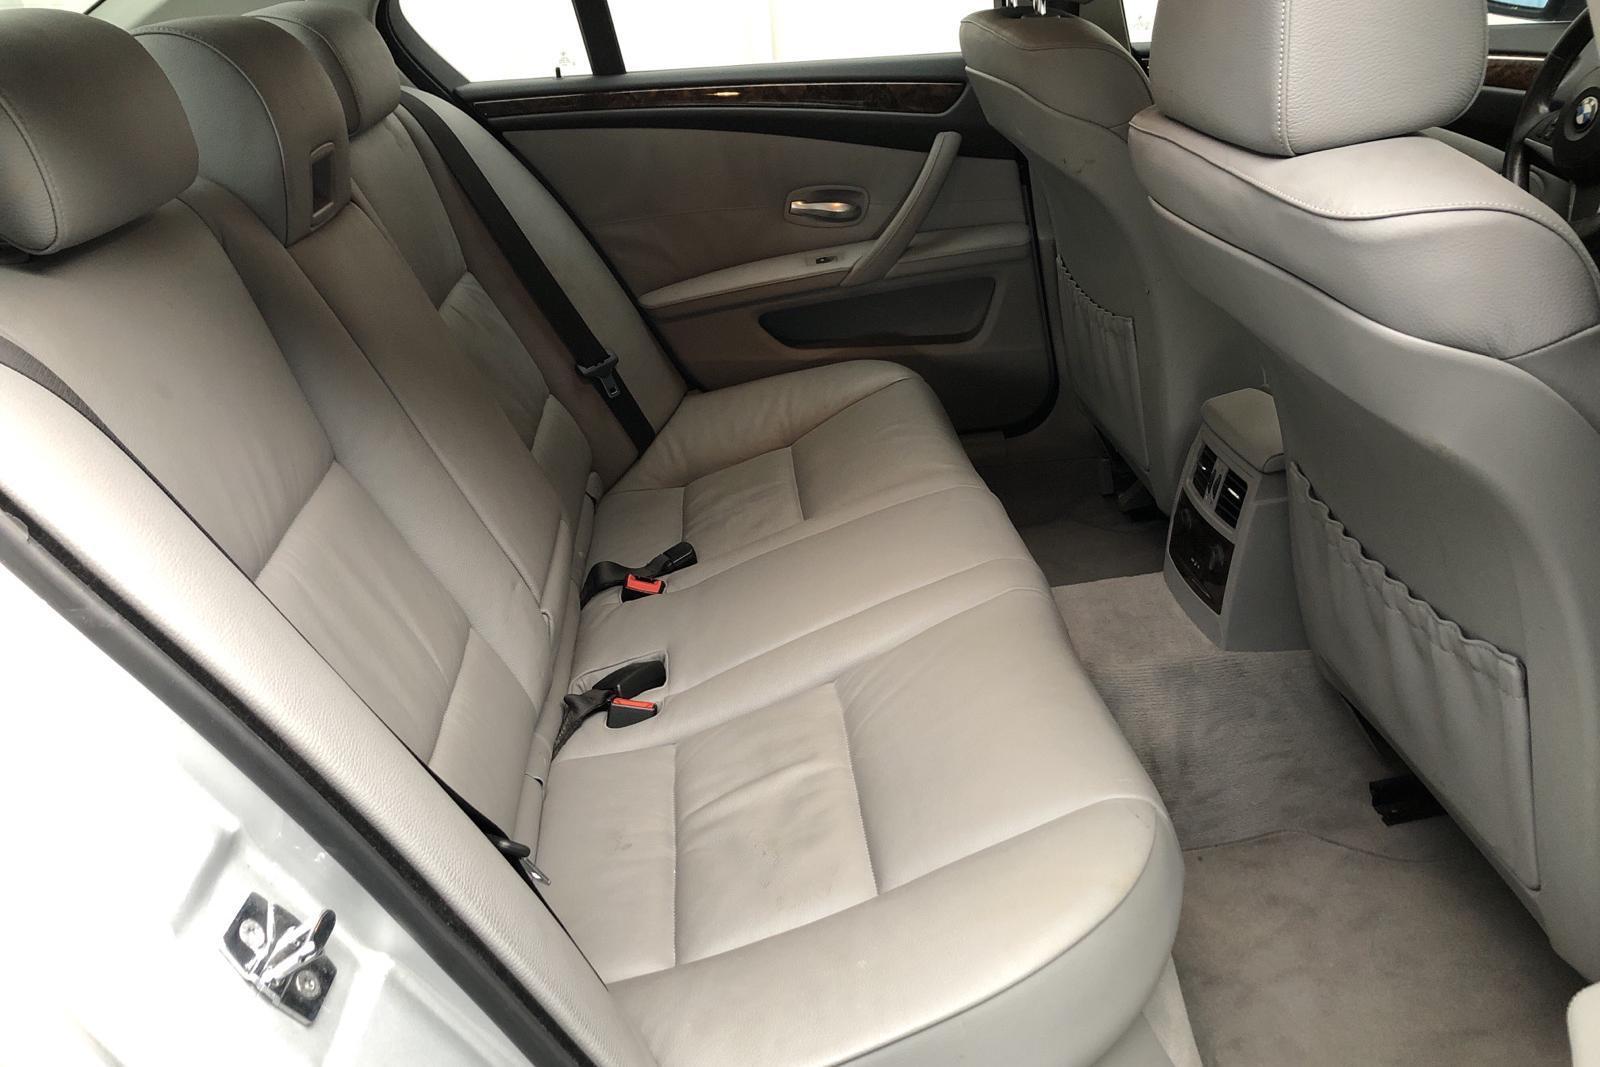 BMW 523i Sedan, E60 (190hk) - 19 358 mil - Manuell - Light Grey - 2007